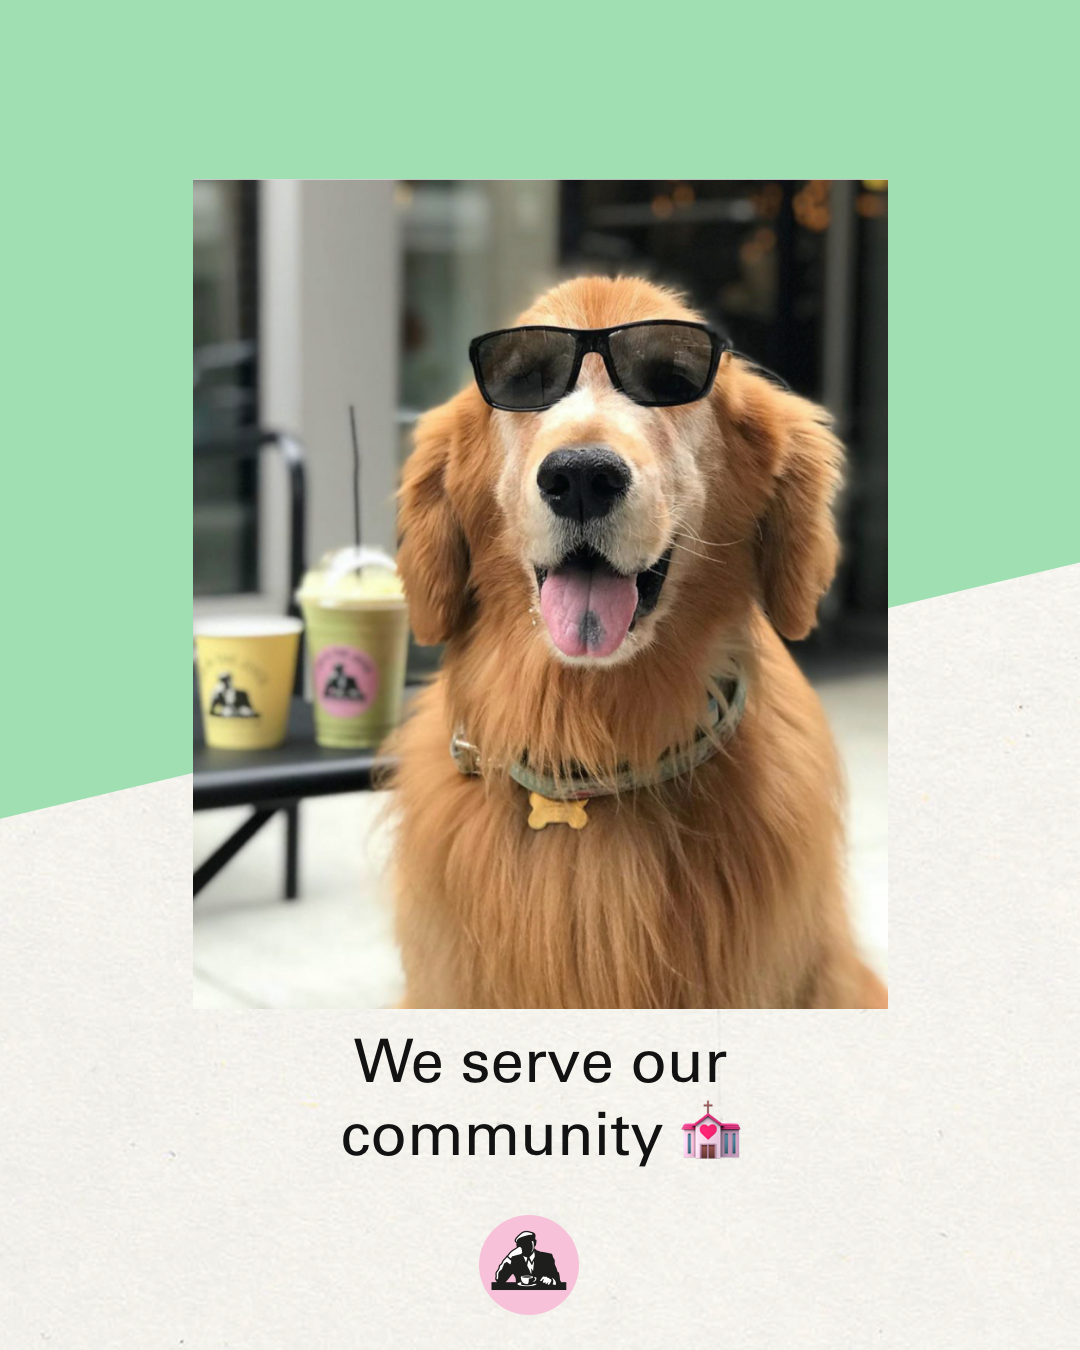 We serve our community